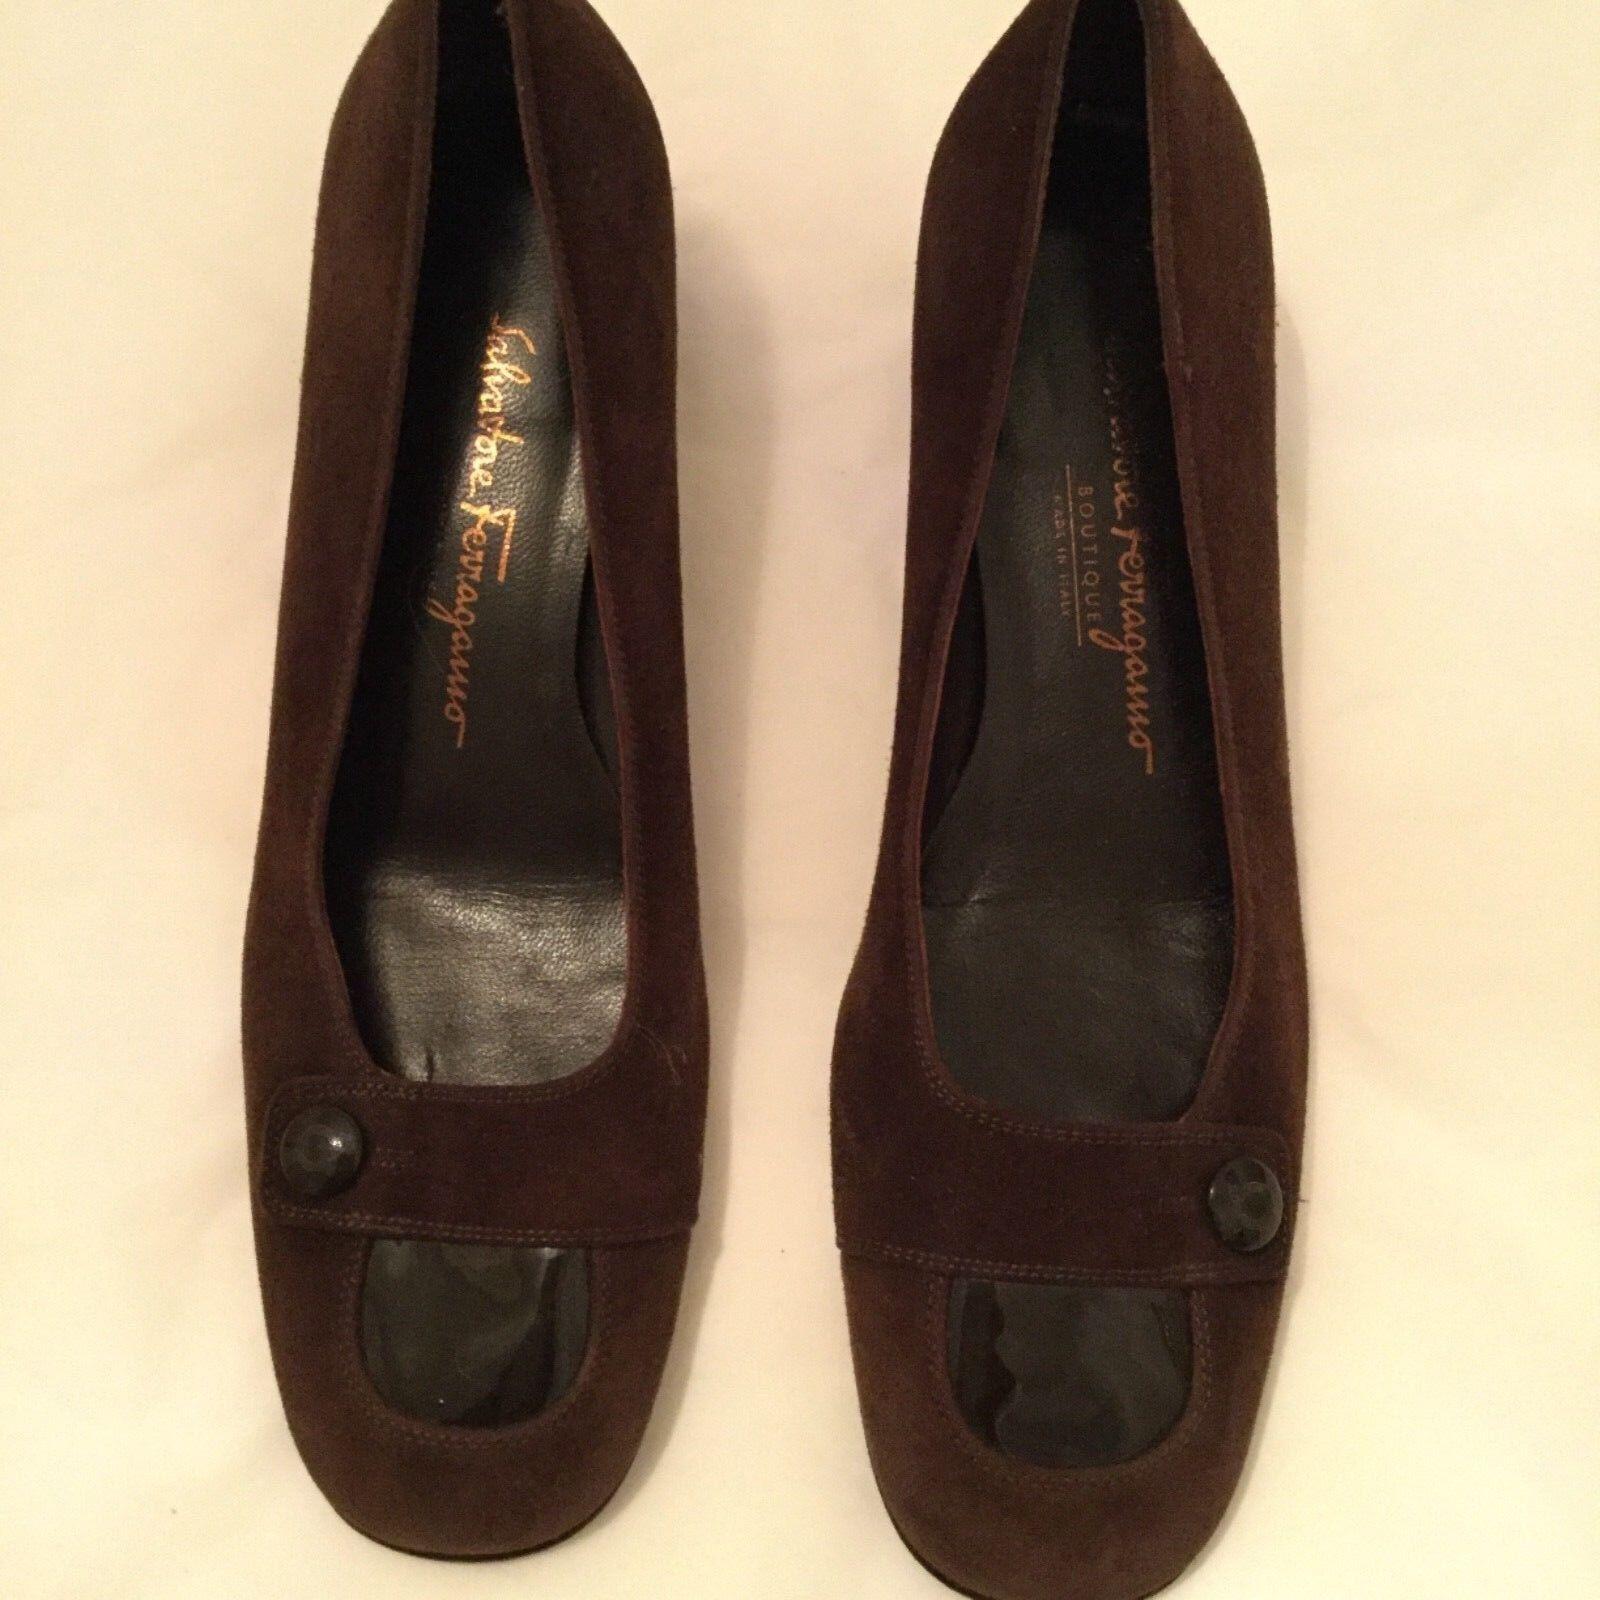 NEW Salvatore Ferragamo braun Suede w  Patent Leather Accents Flats - 6.5B